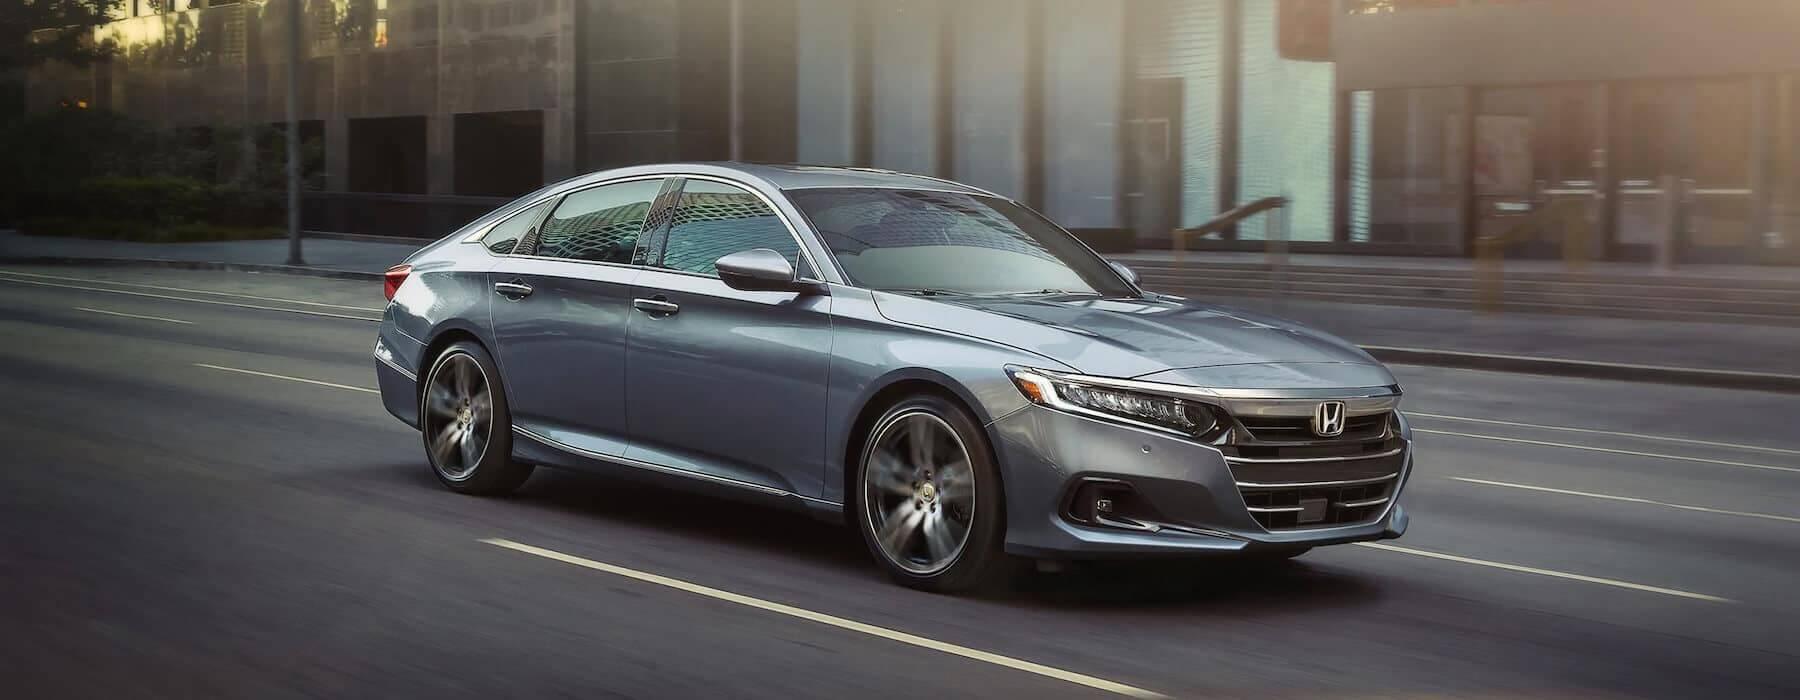 Introducing the 2021 Honda Accord Hero Image